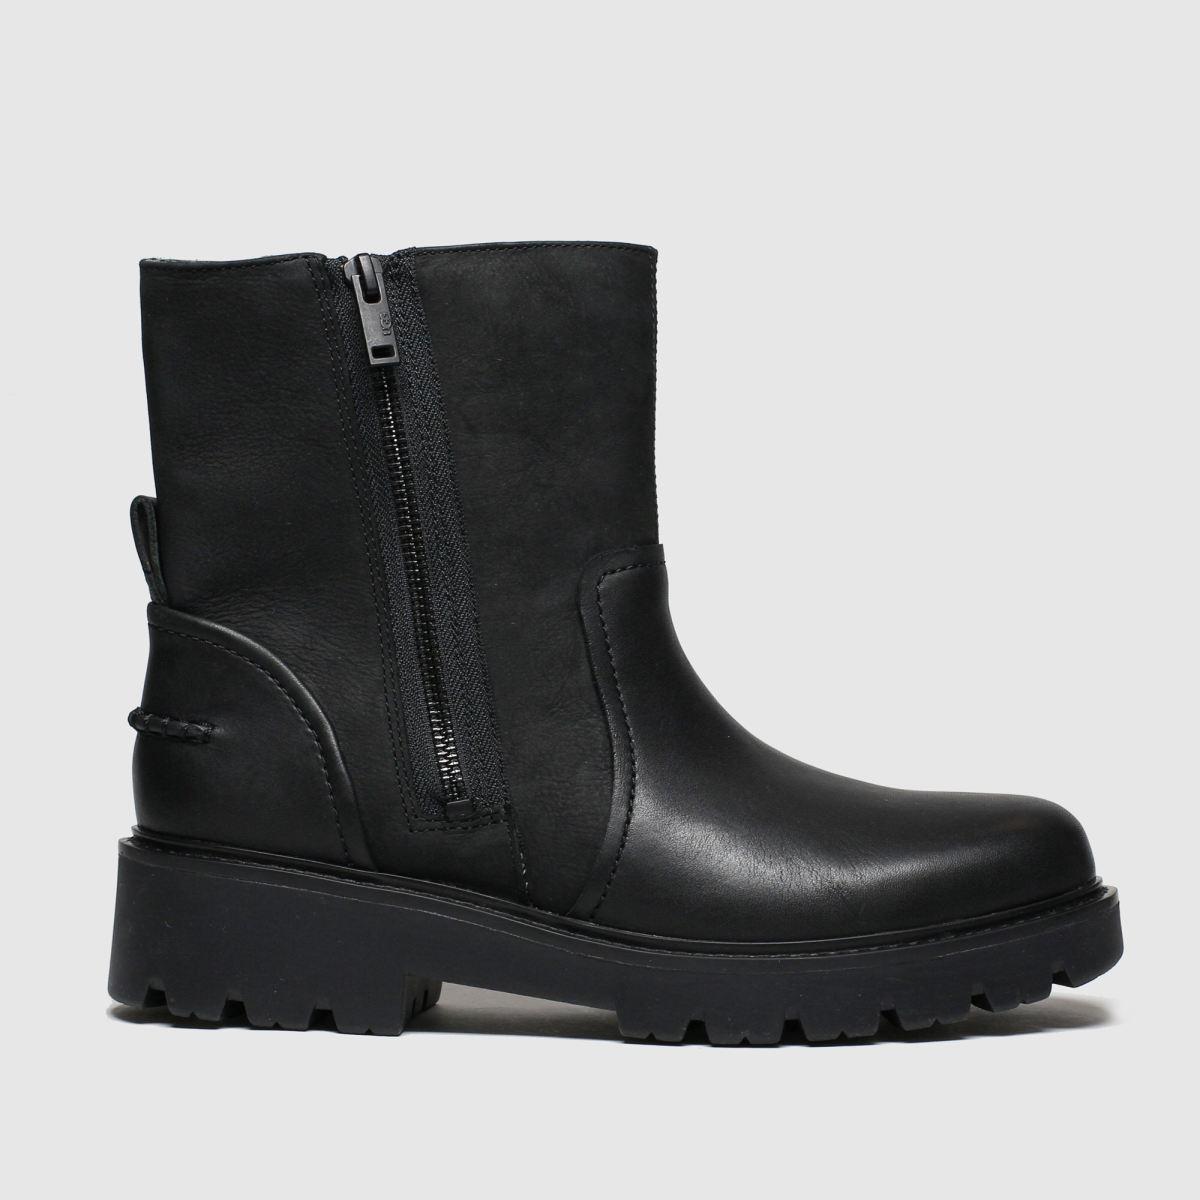 Ugg Black Polk Boots